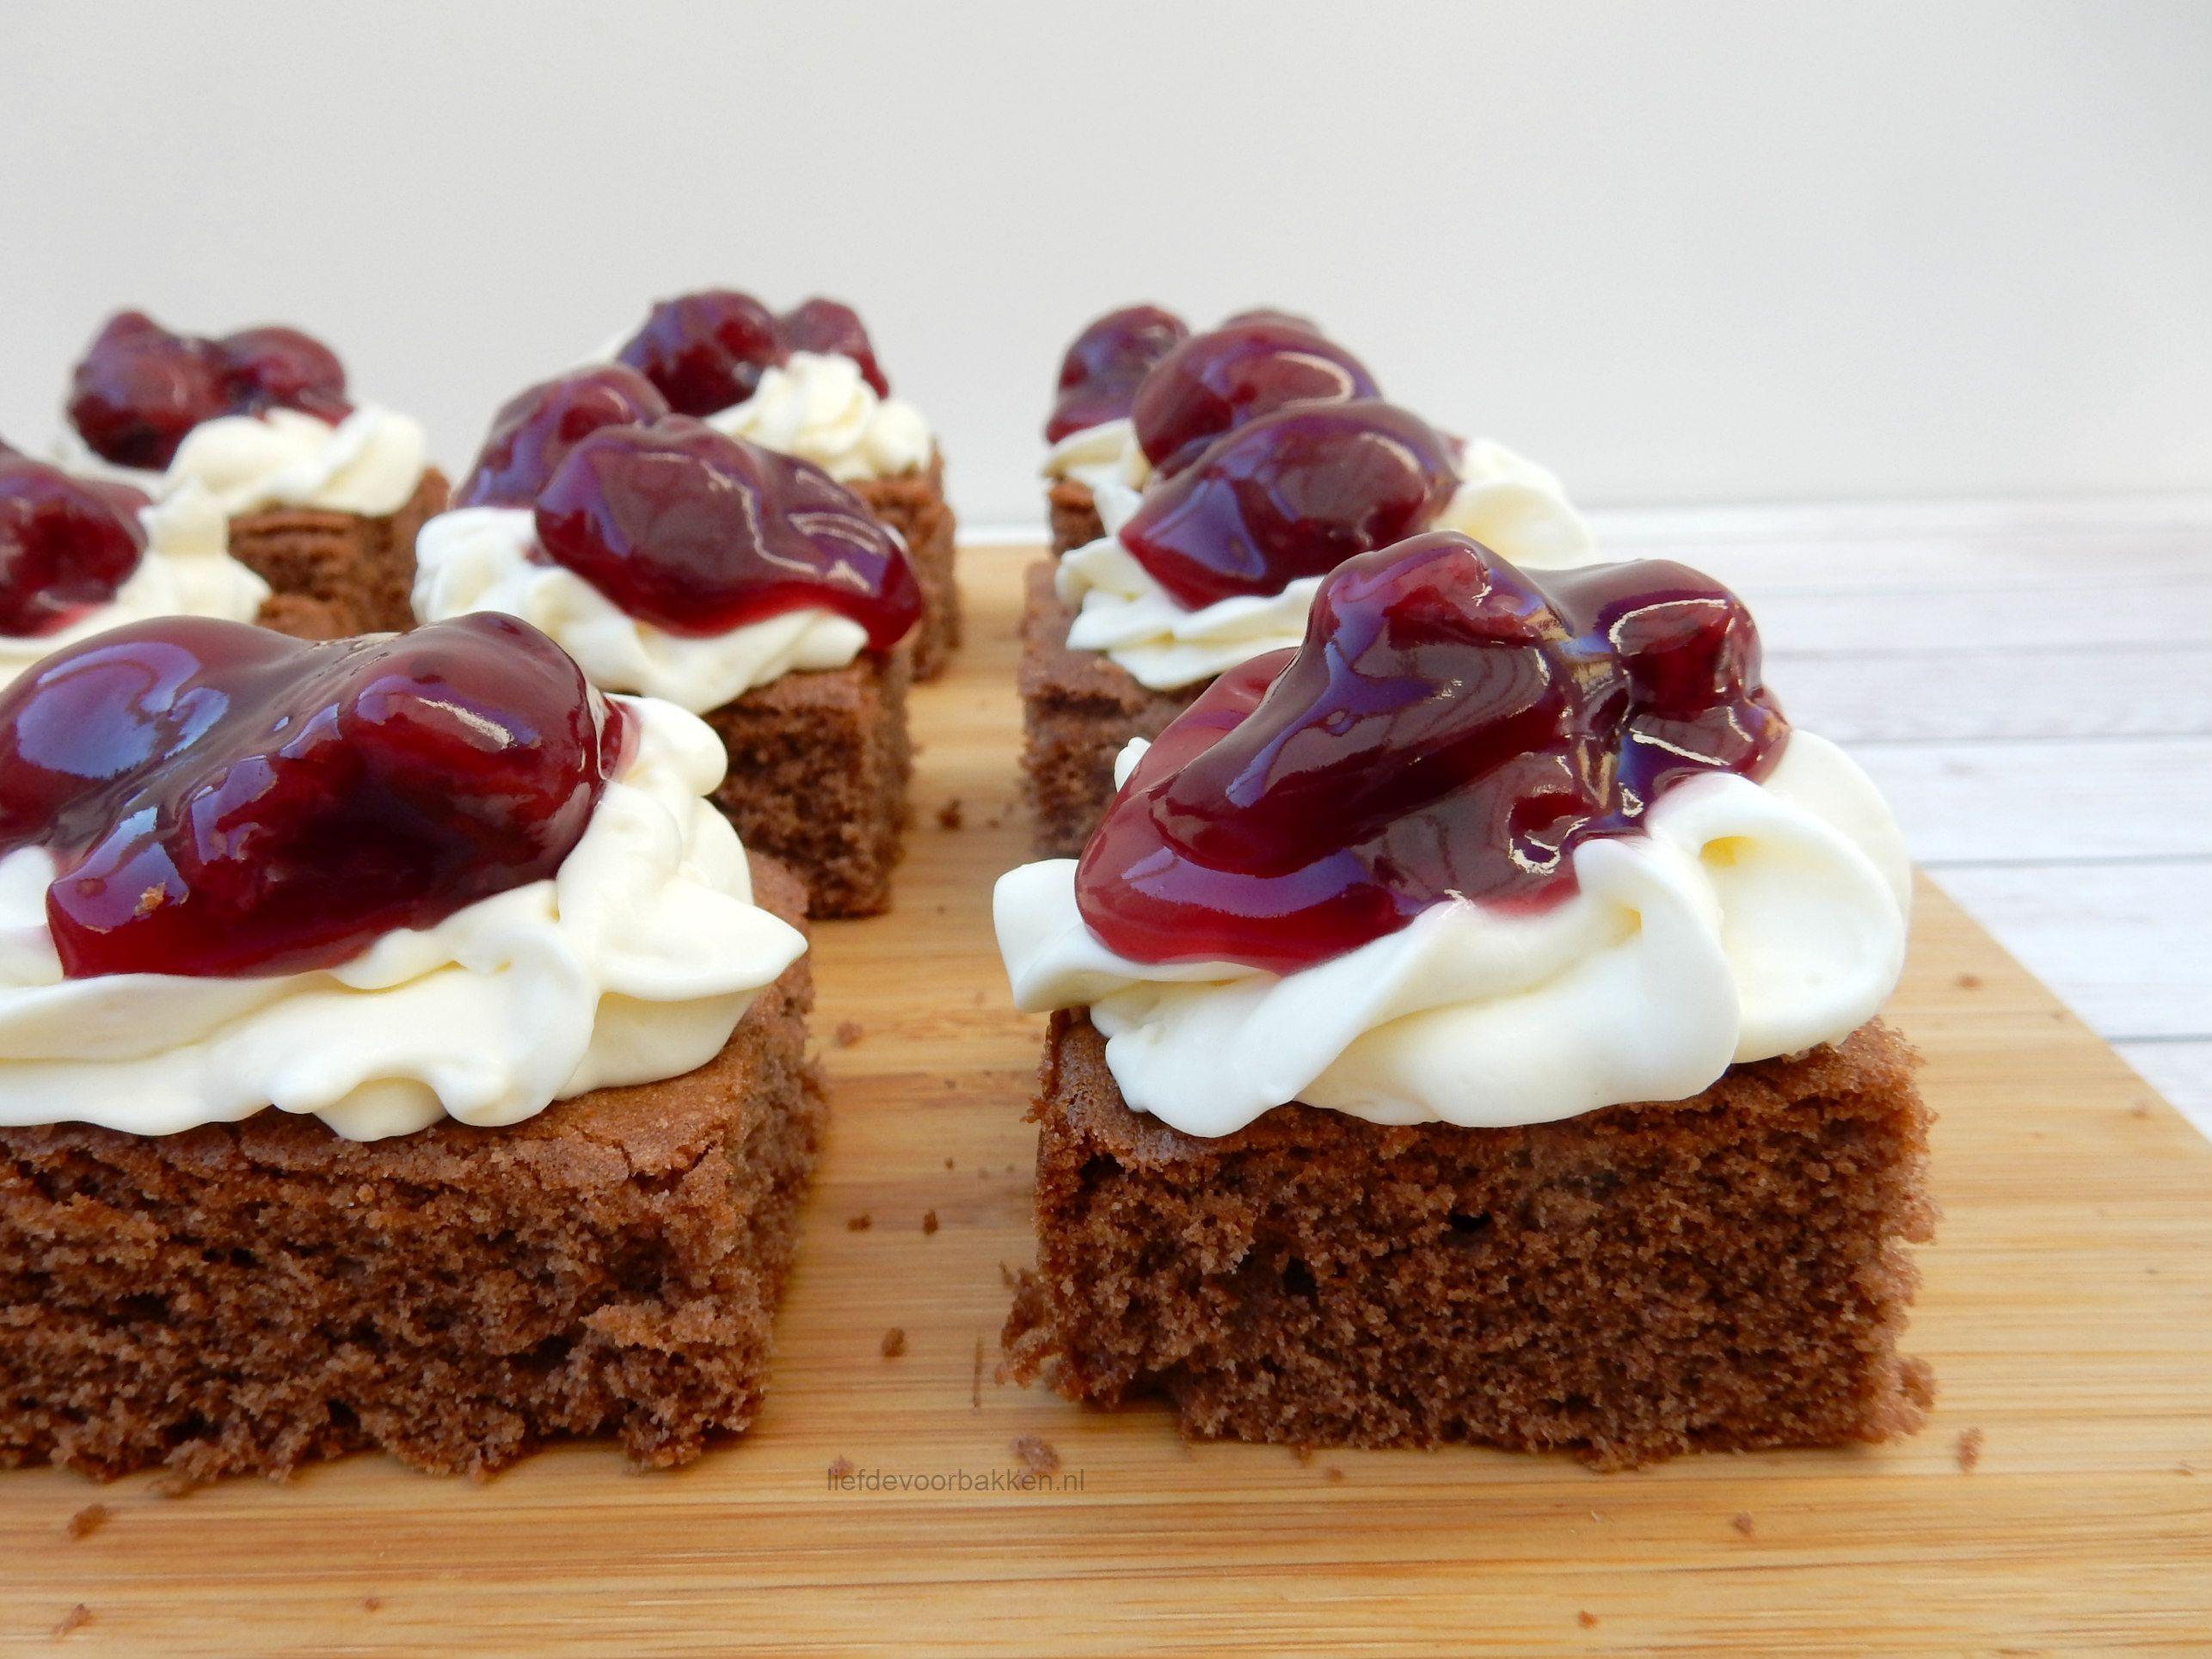 Monchou Petit Fourtje Cakerecepten Dessert Ideeen Bakkerijen